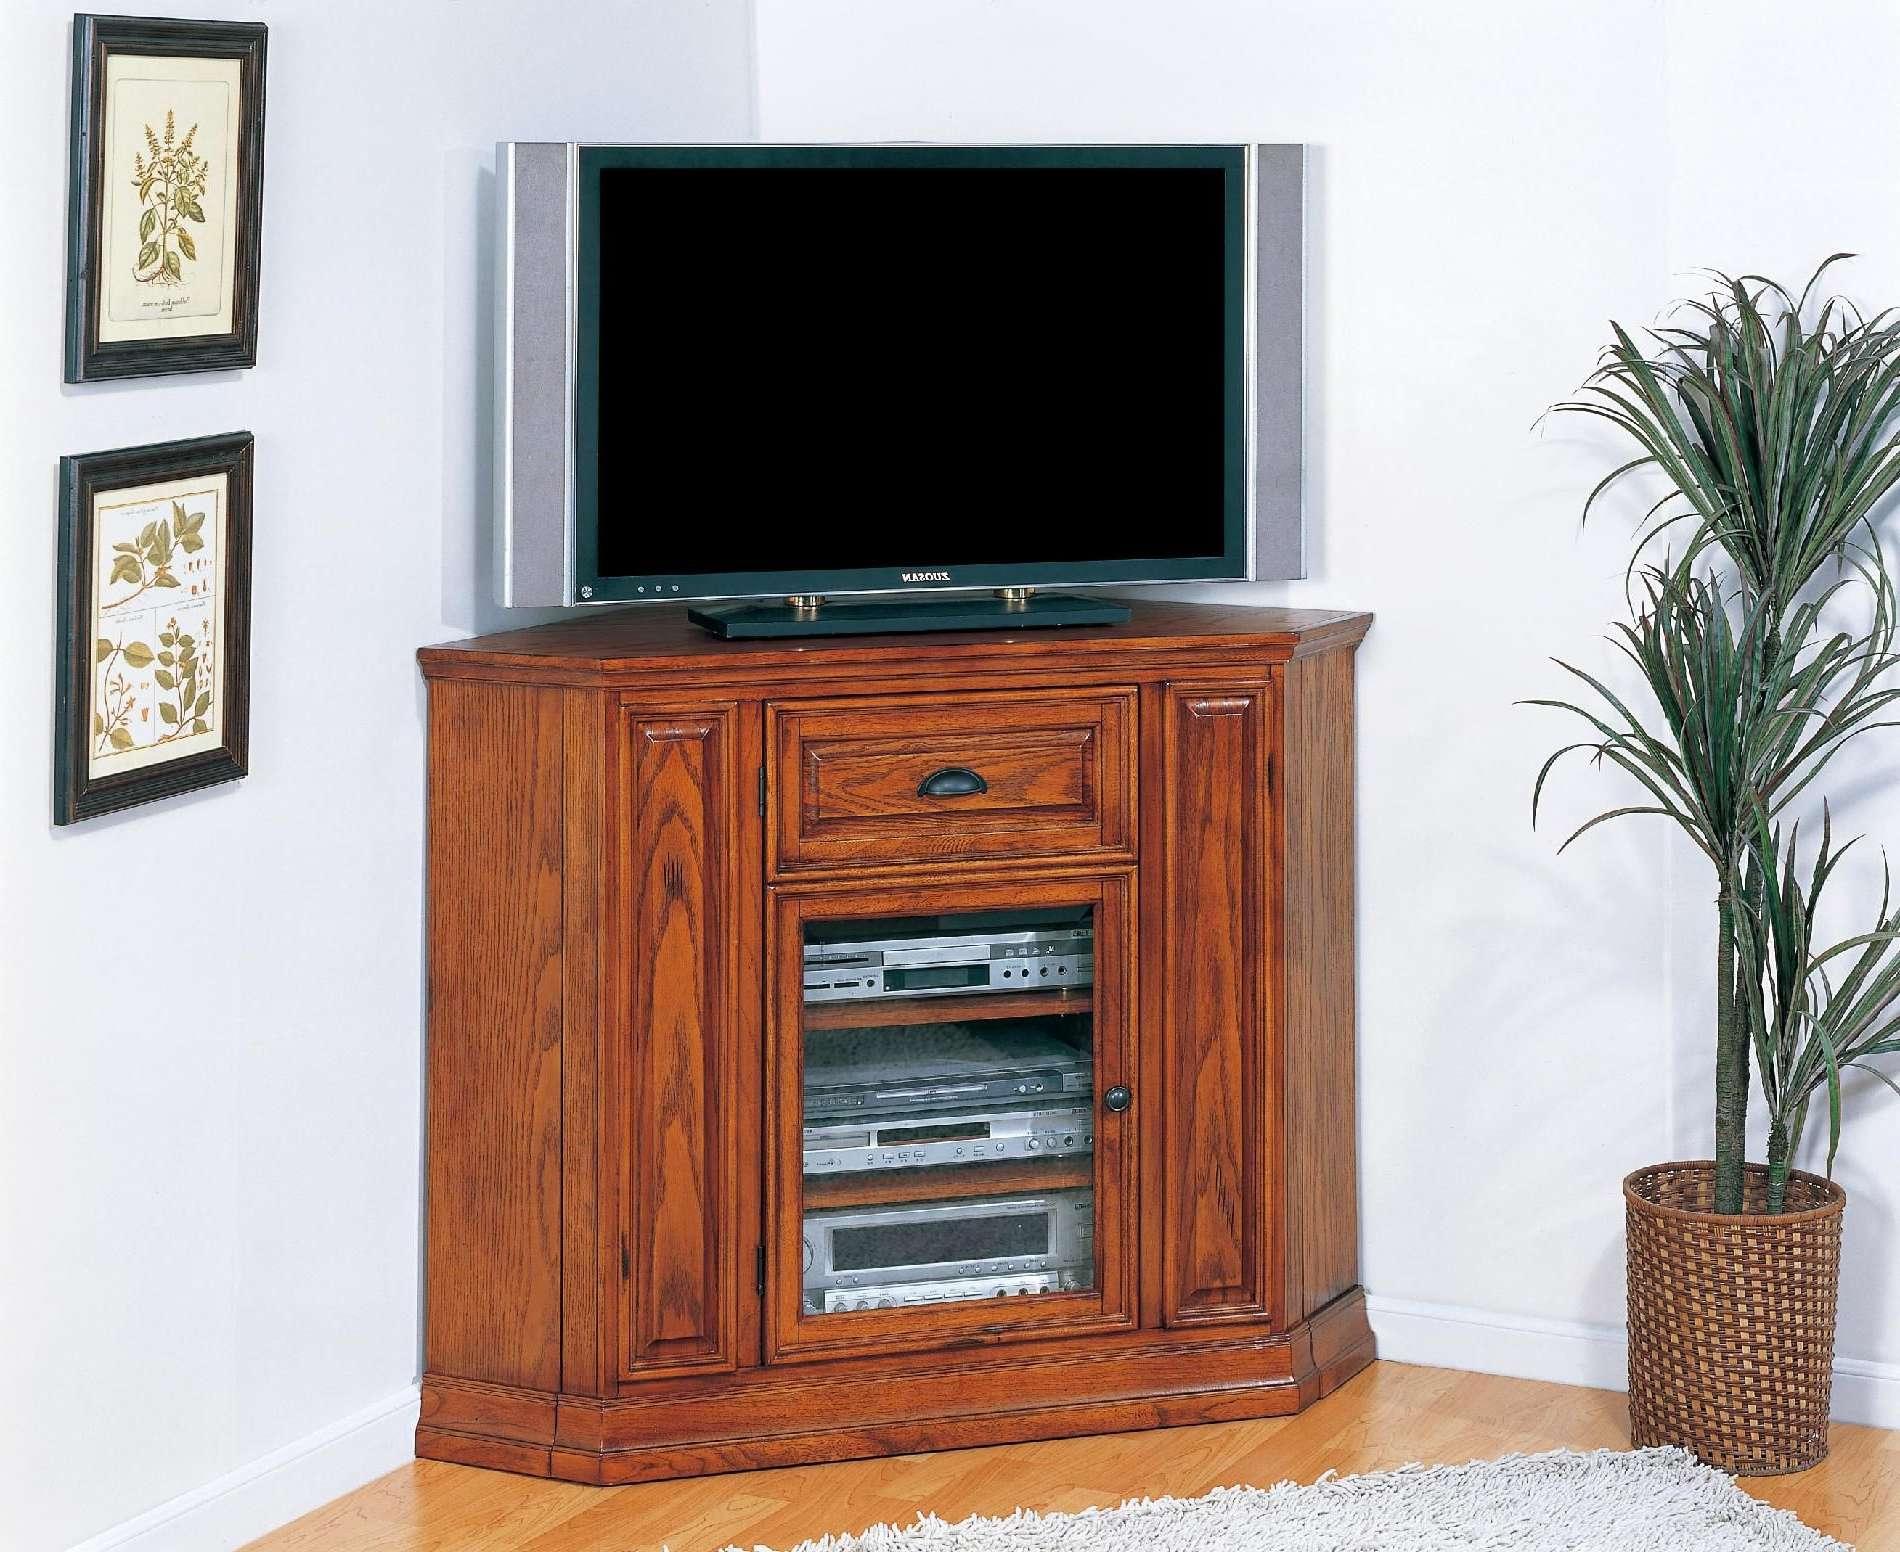 Tall Corner Tv Stand White (View 7 of 15)